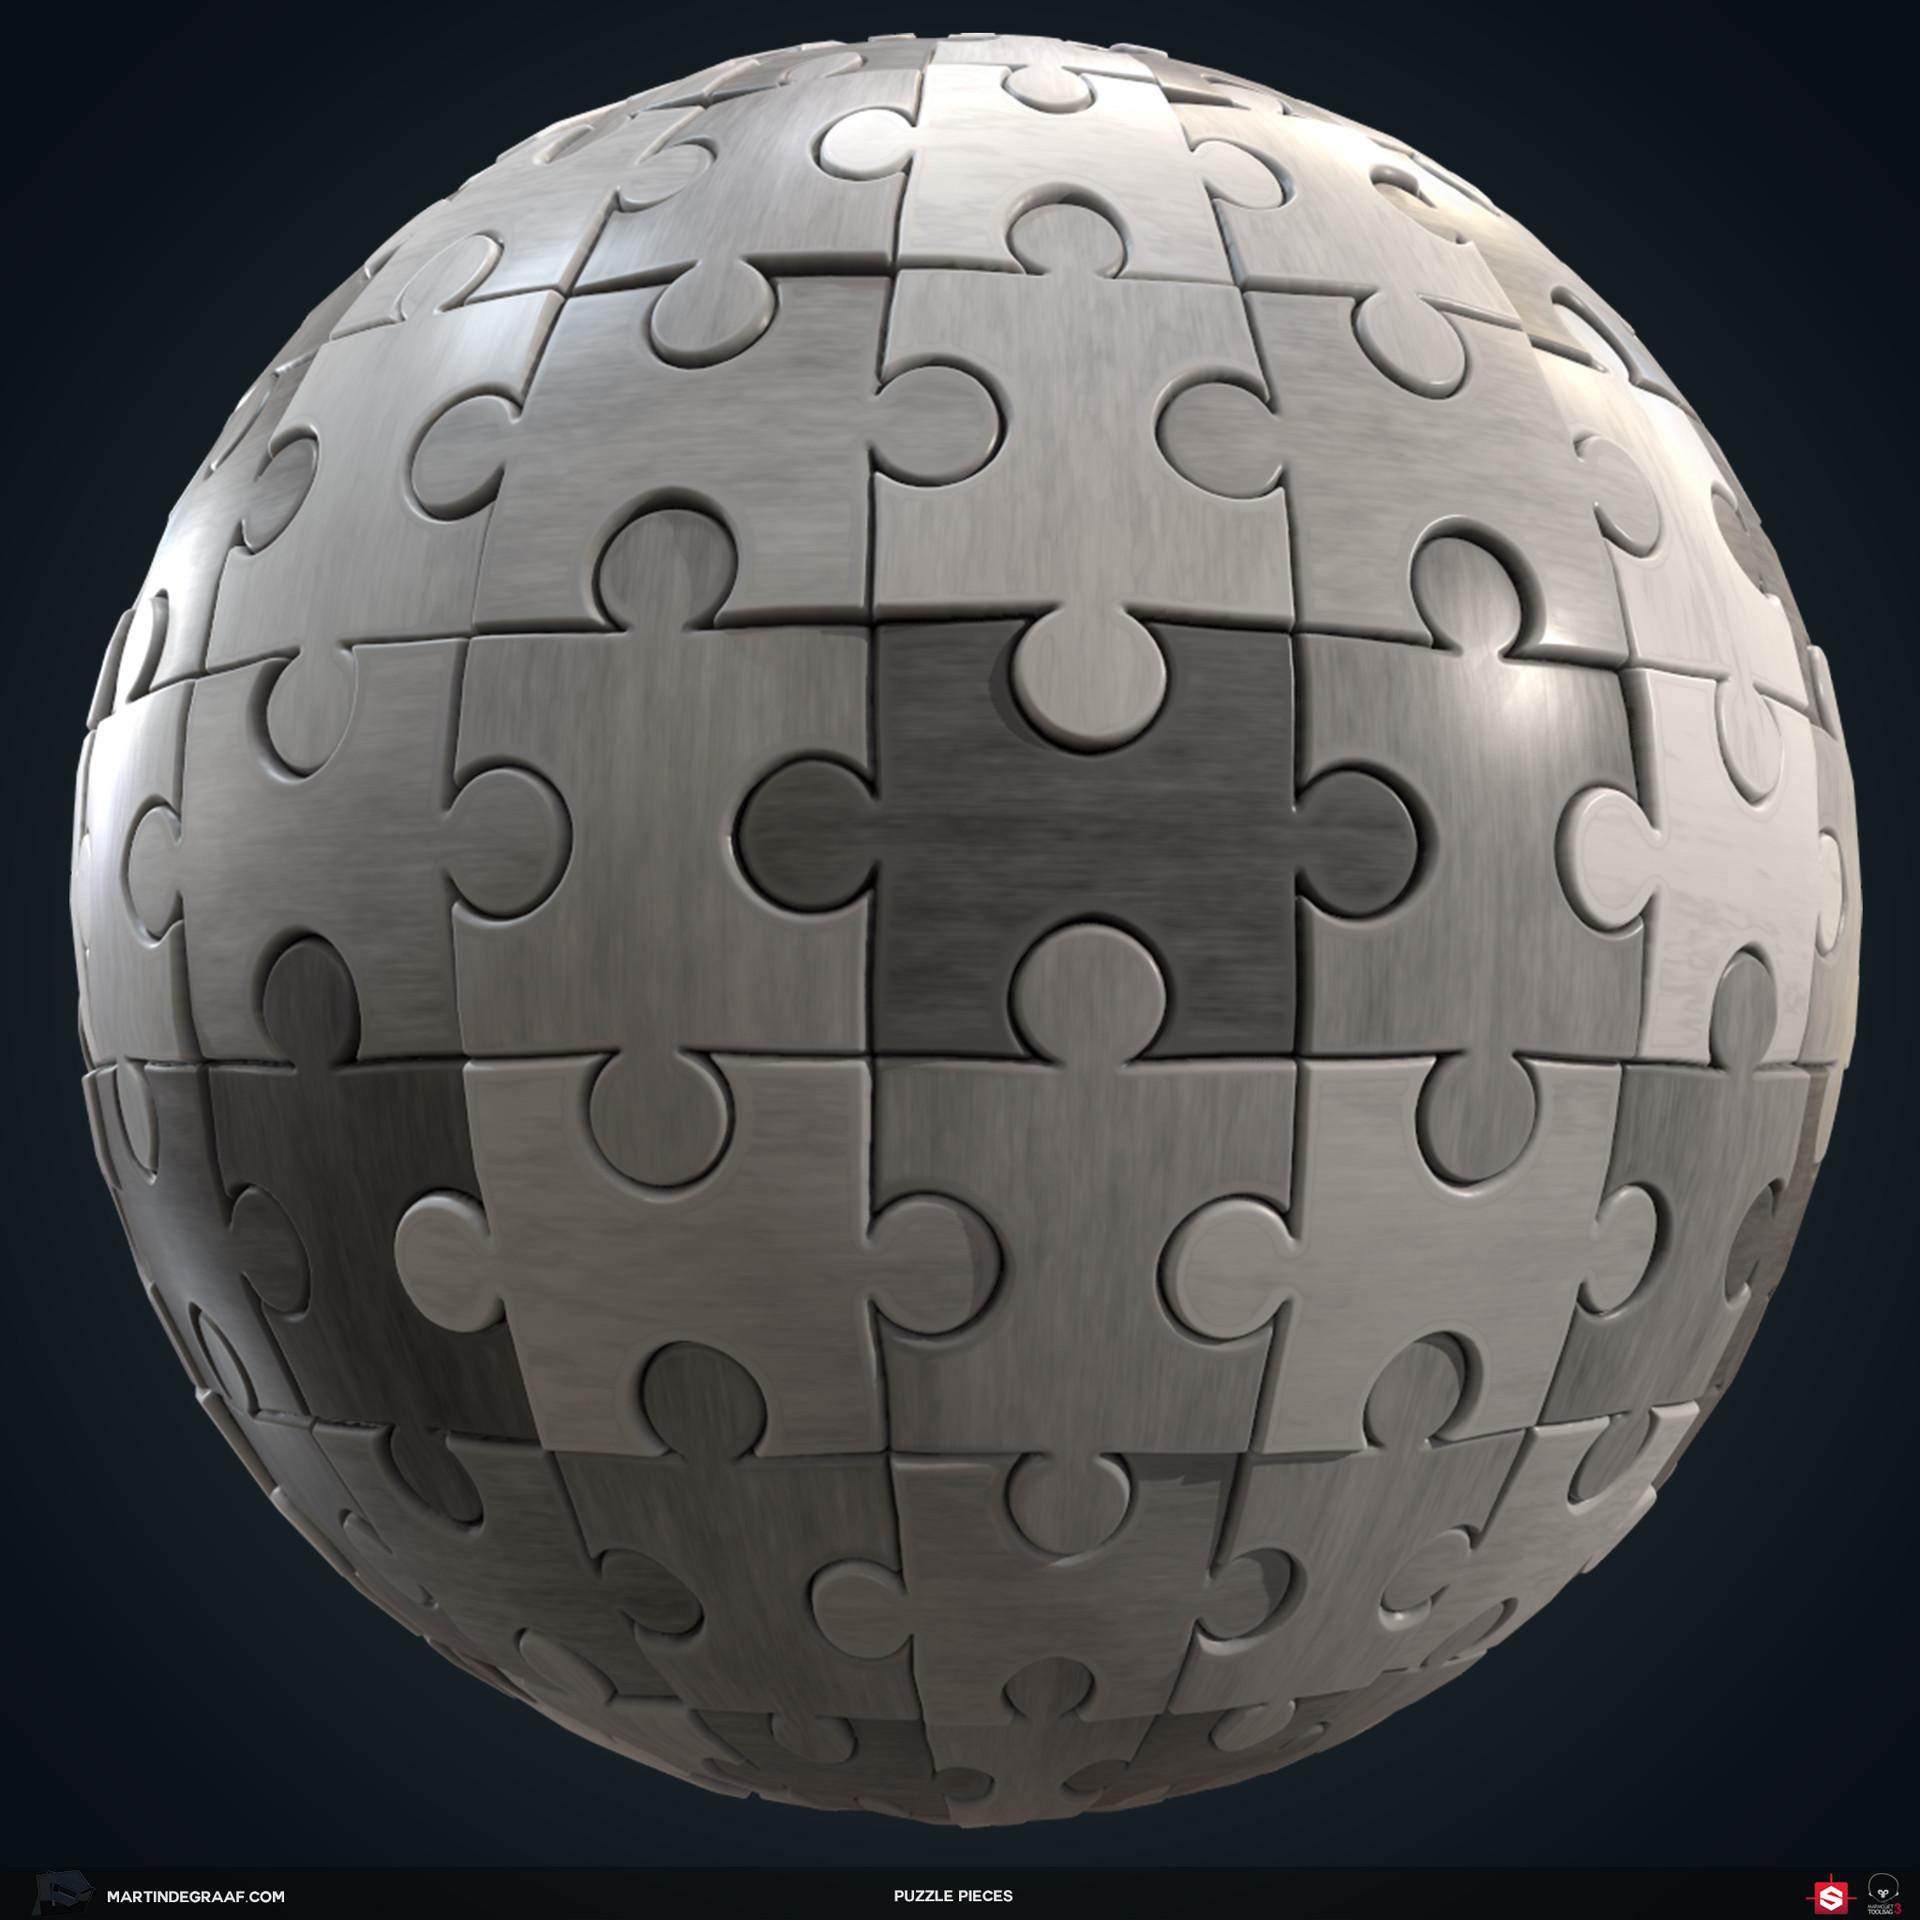 Martin de graaf puzzle pieces substance sphere martin de graaf 2018